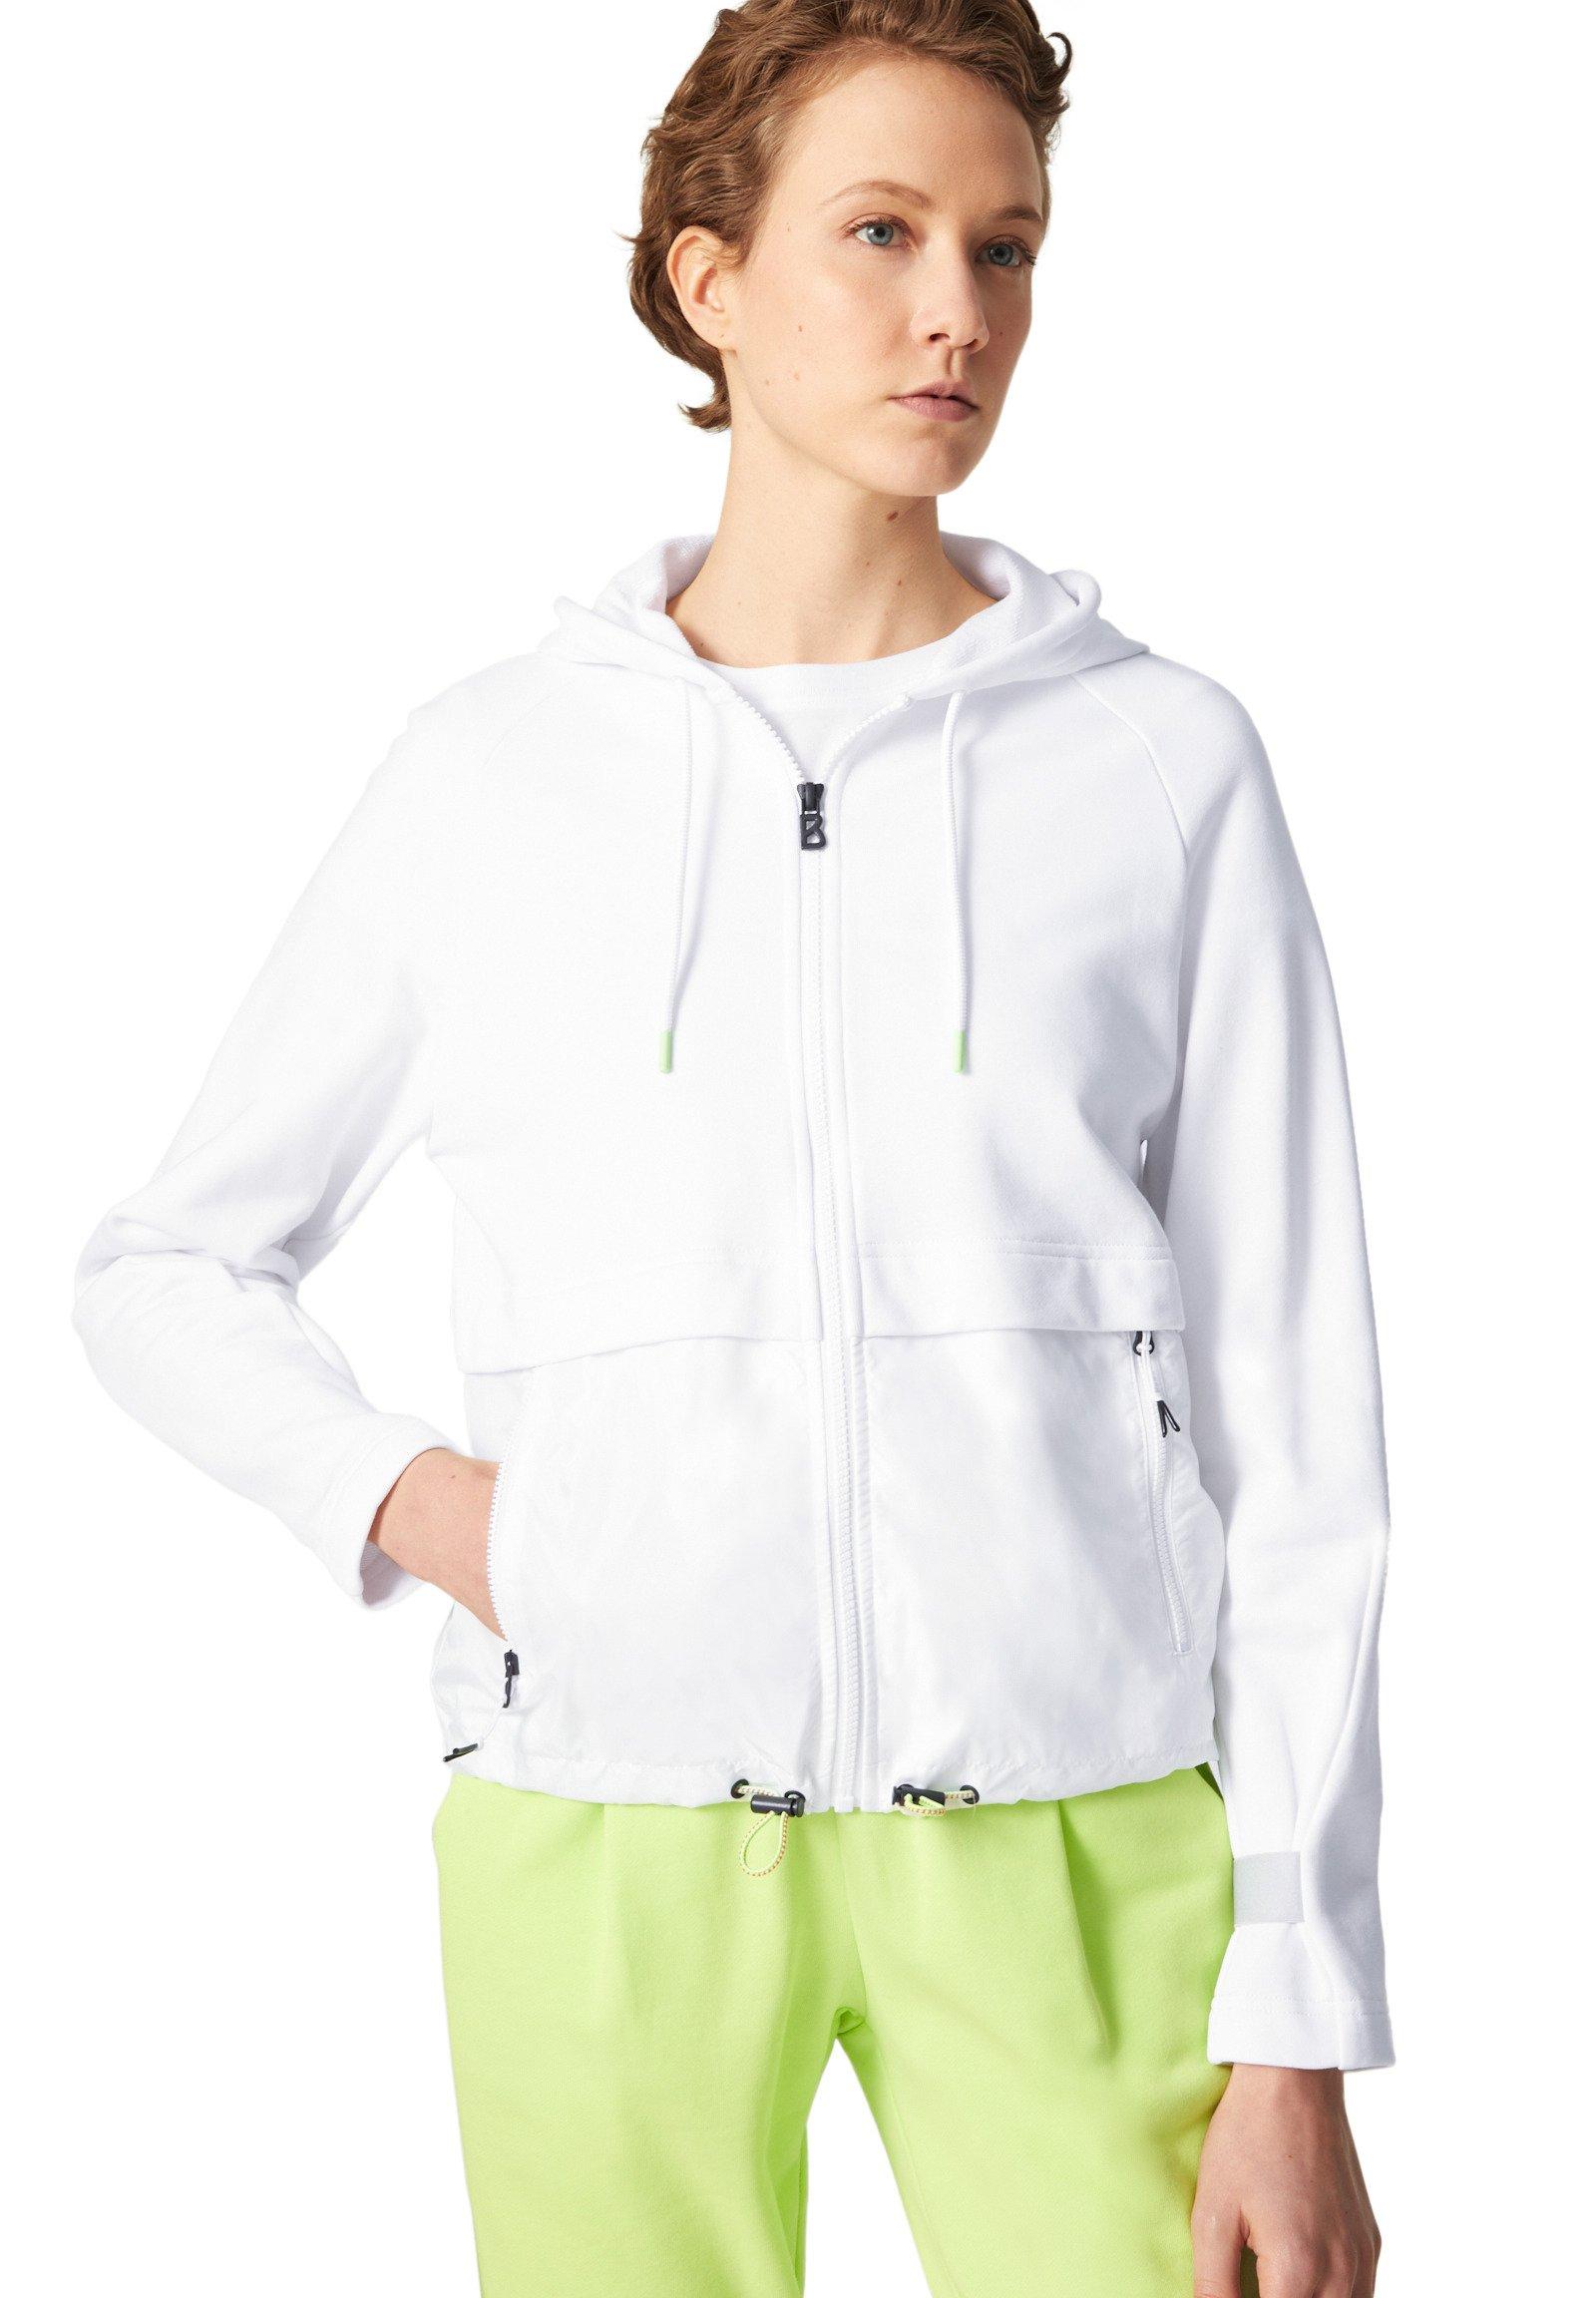 Femme AURORA - Sweat à capuche zippé